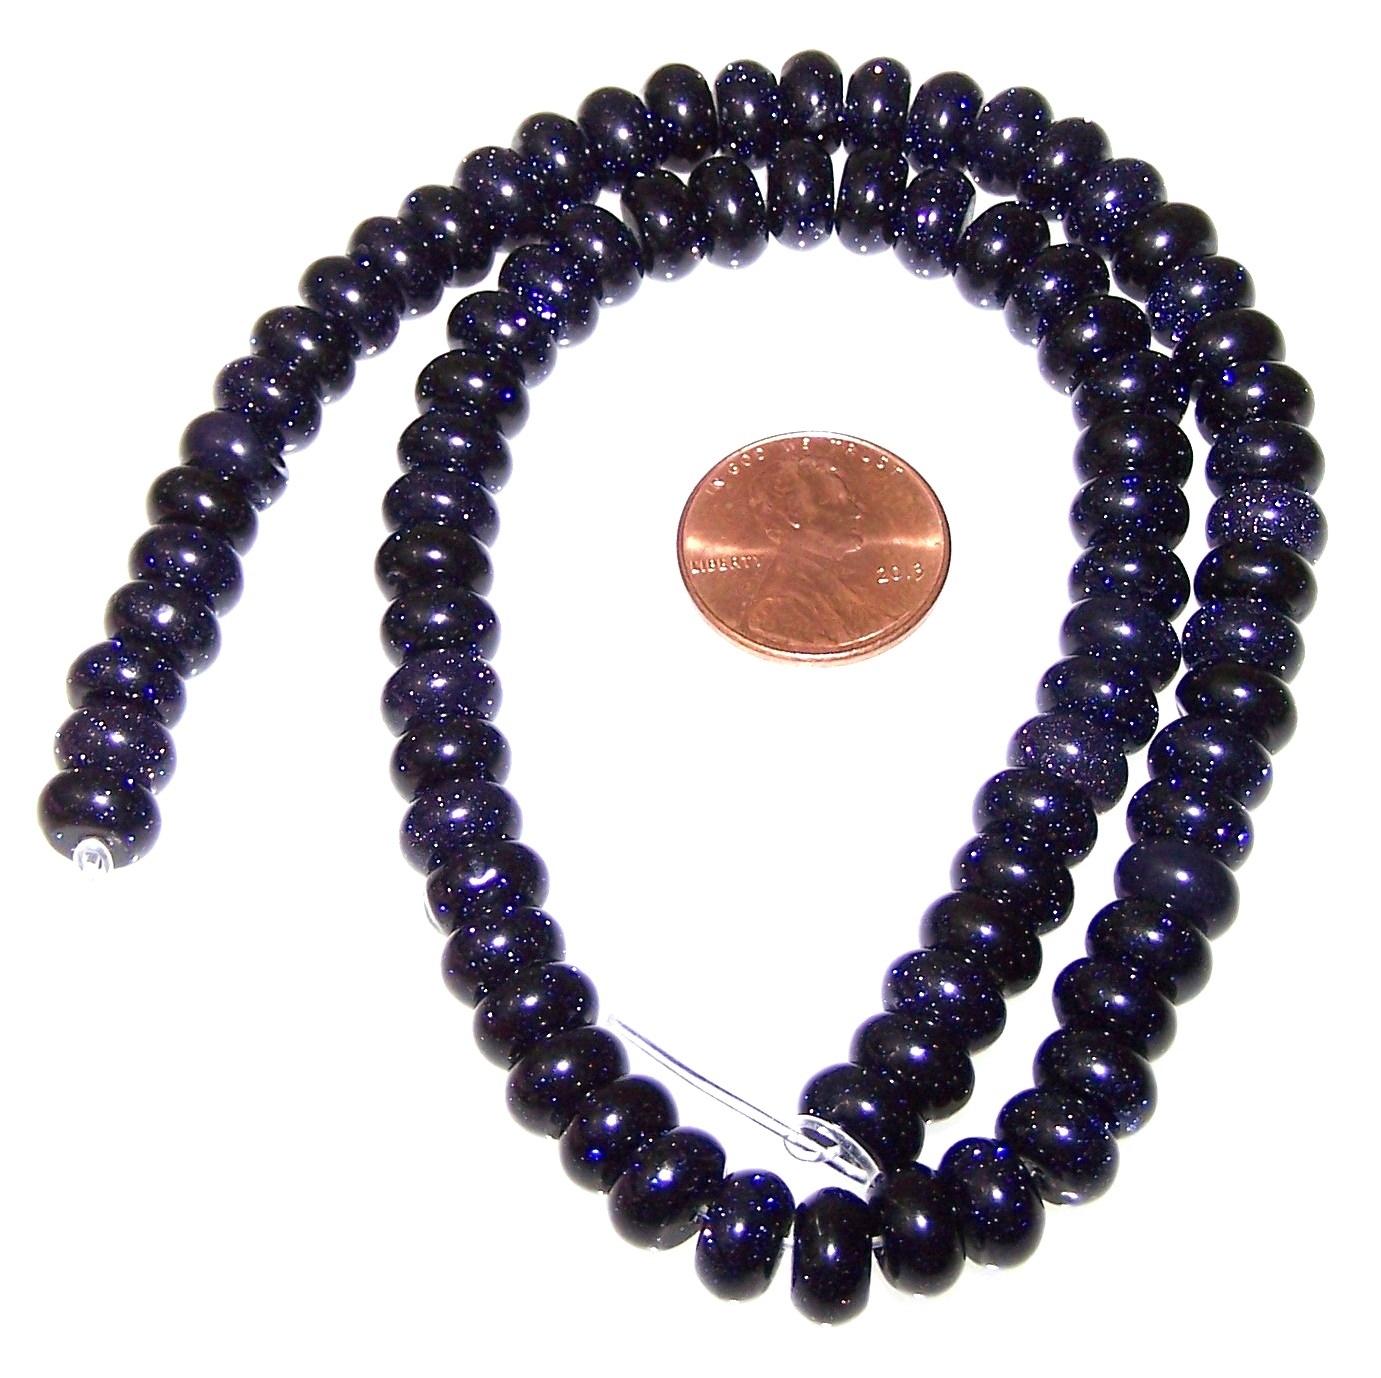 Large Hole smooth gemstone 8mm Goldstone Round Beads gem0599 half strand